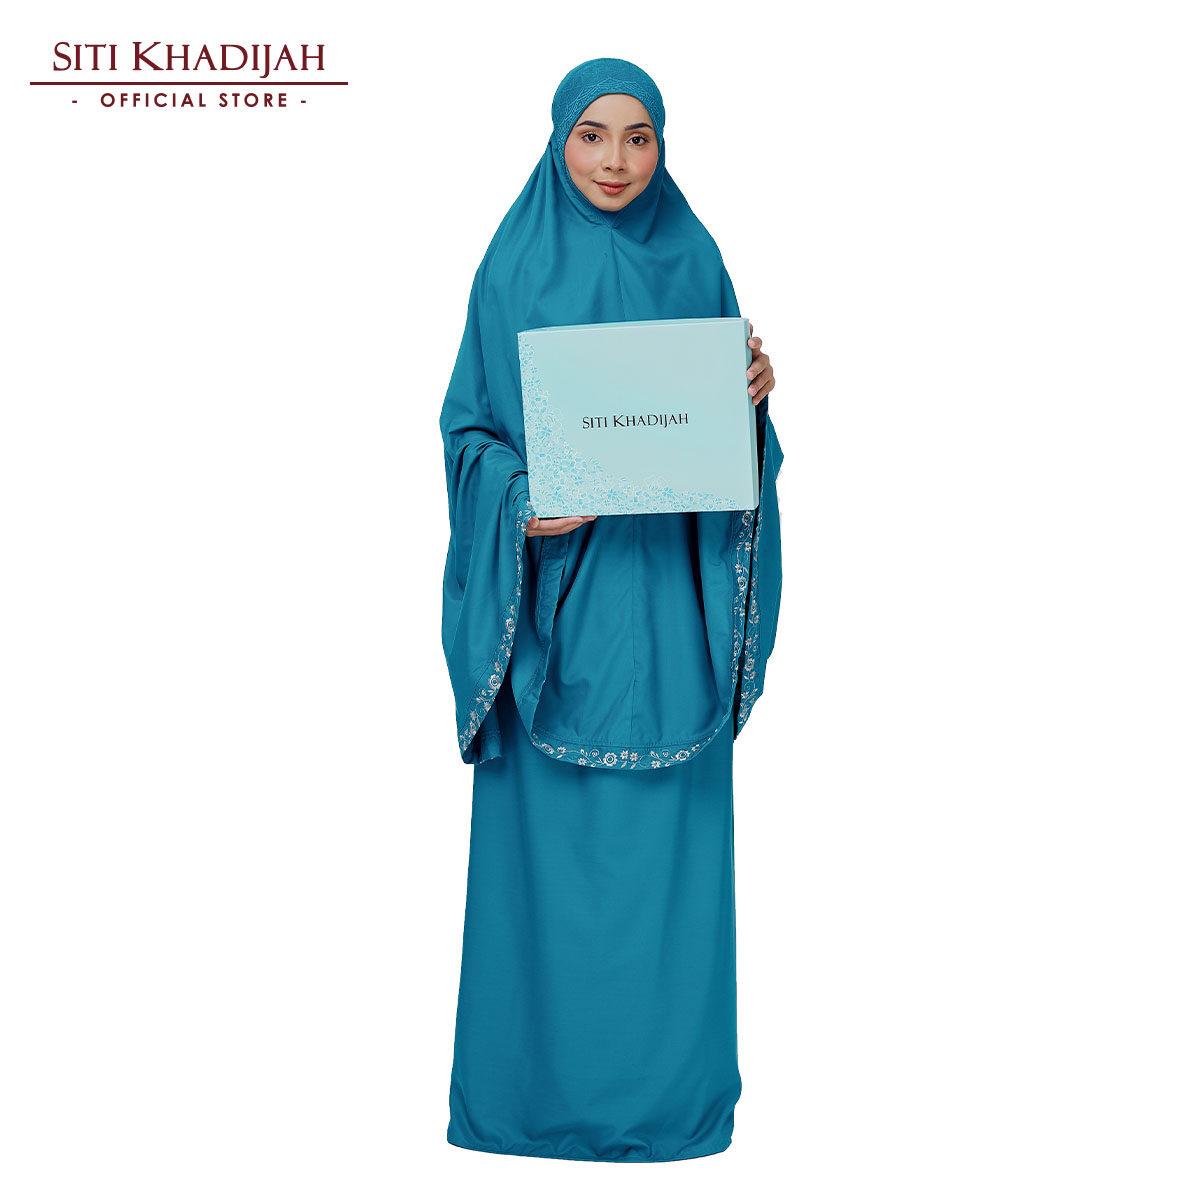 Siti Khadijah Broderie Eshal in Turquoise (Free Box)